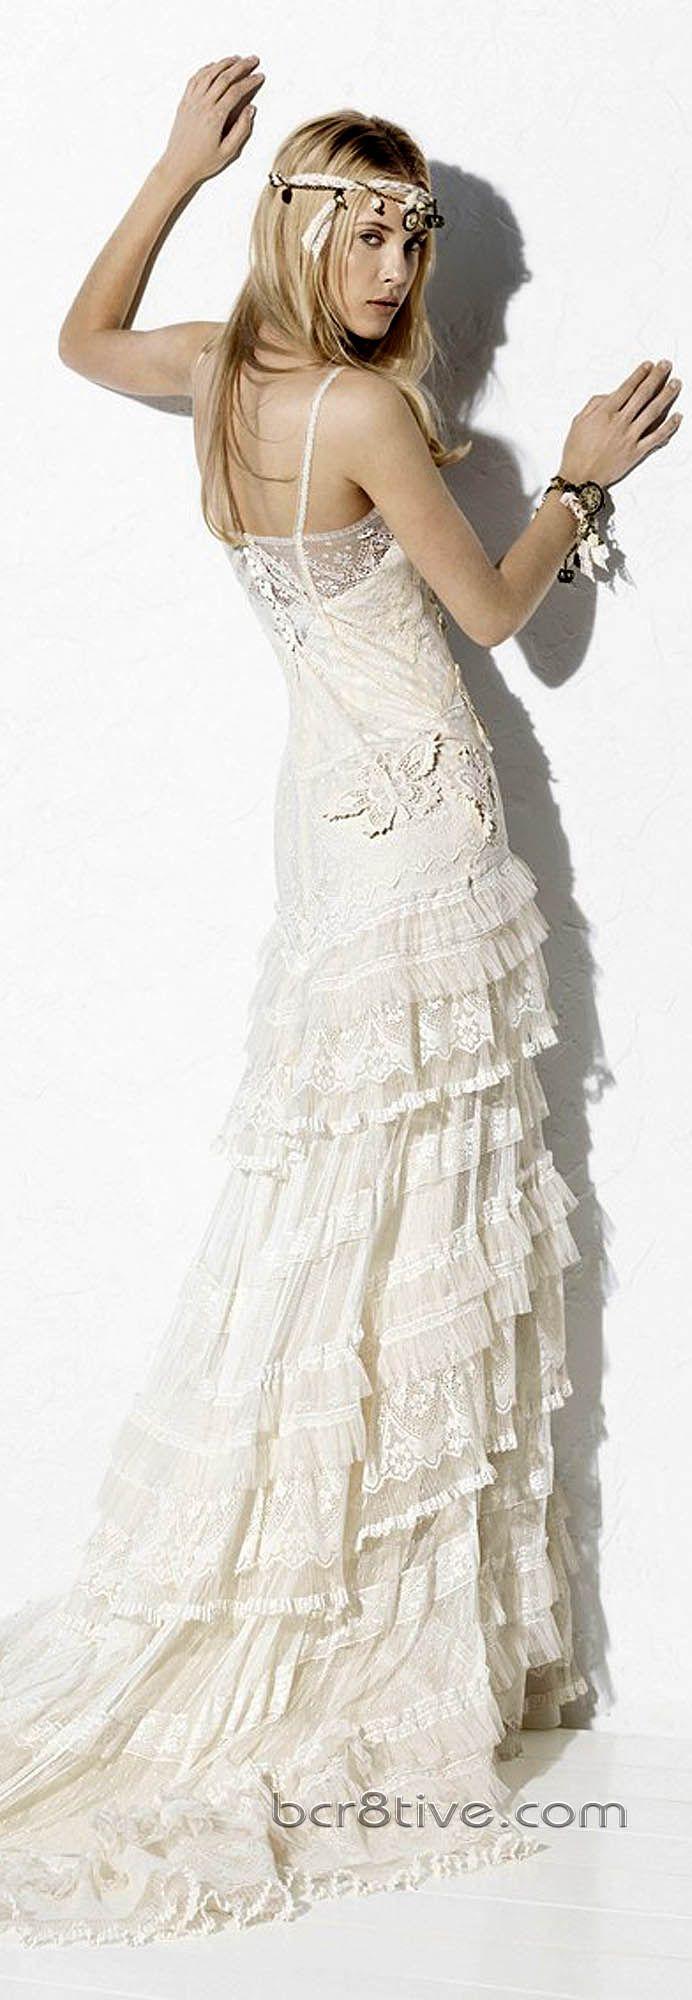 Ronald joyce lace wedding dress september 2018  best wedding images on Pinterest  Weddings Bridal bouquets and